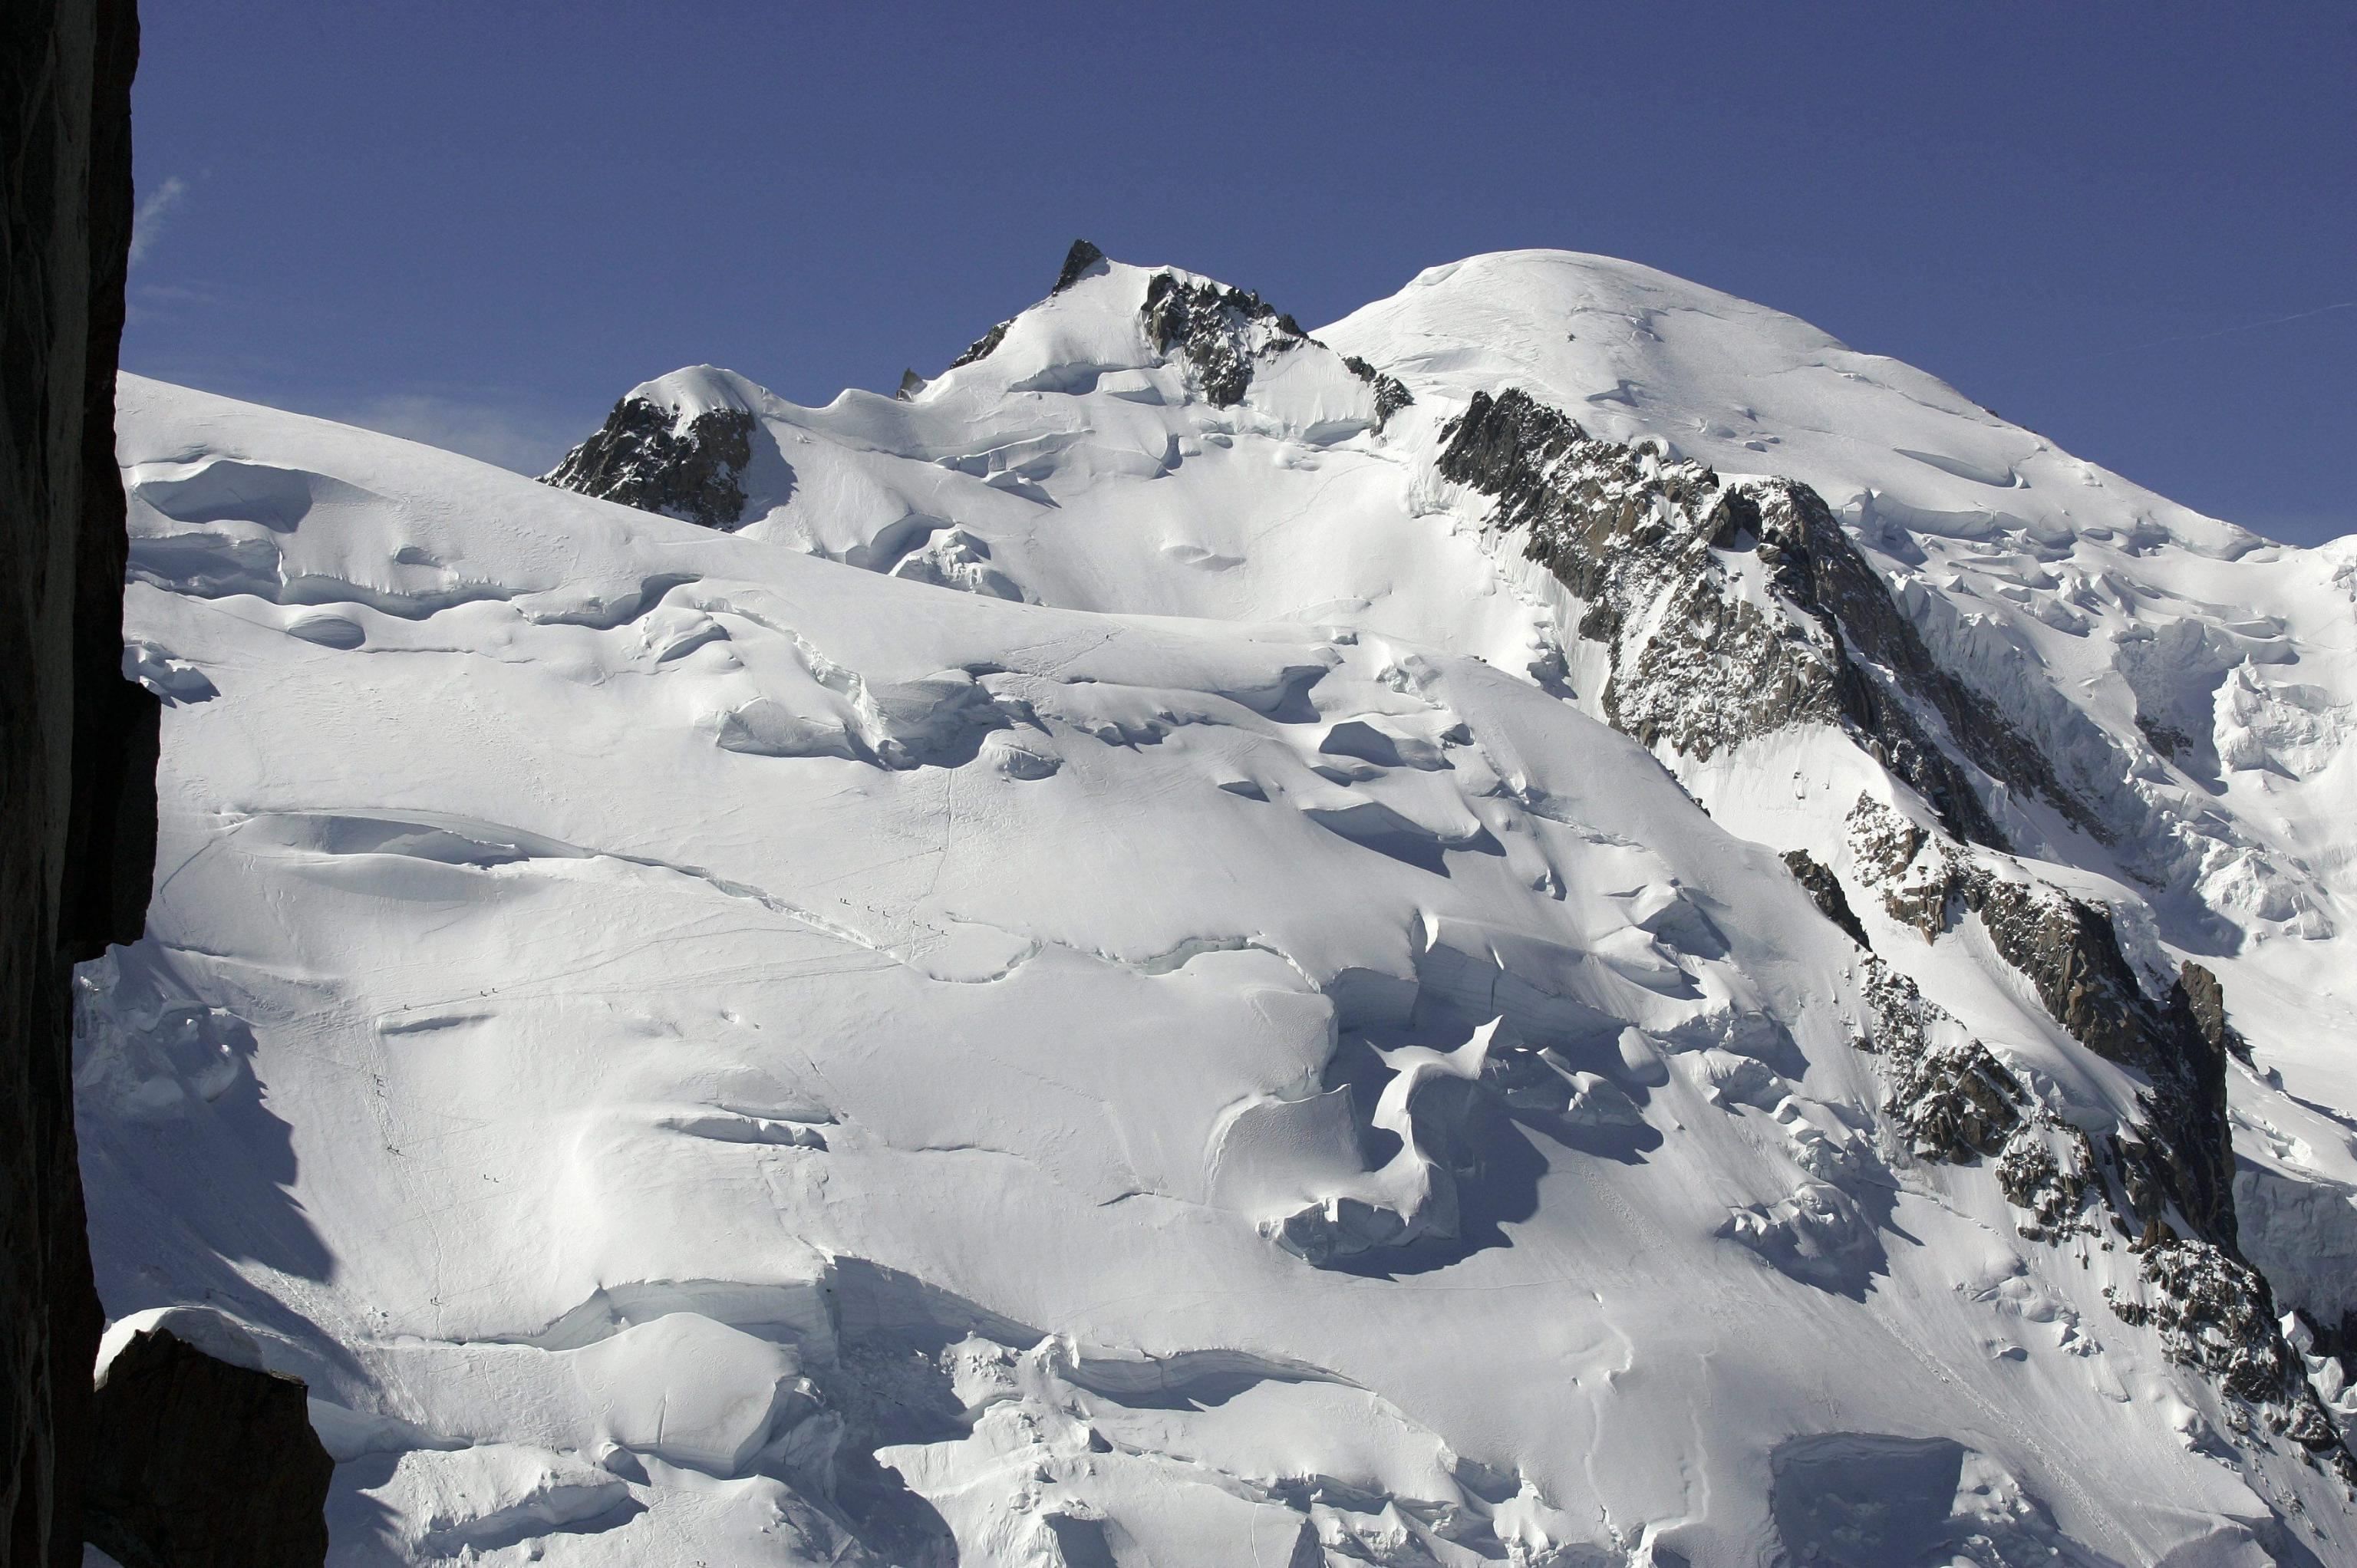 Il Monte Bianco dal versante francese